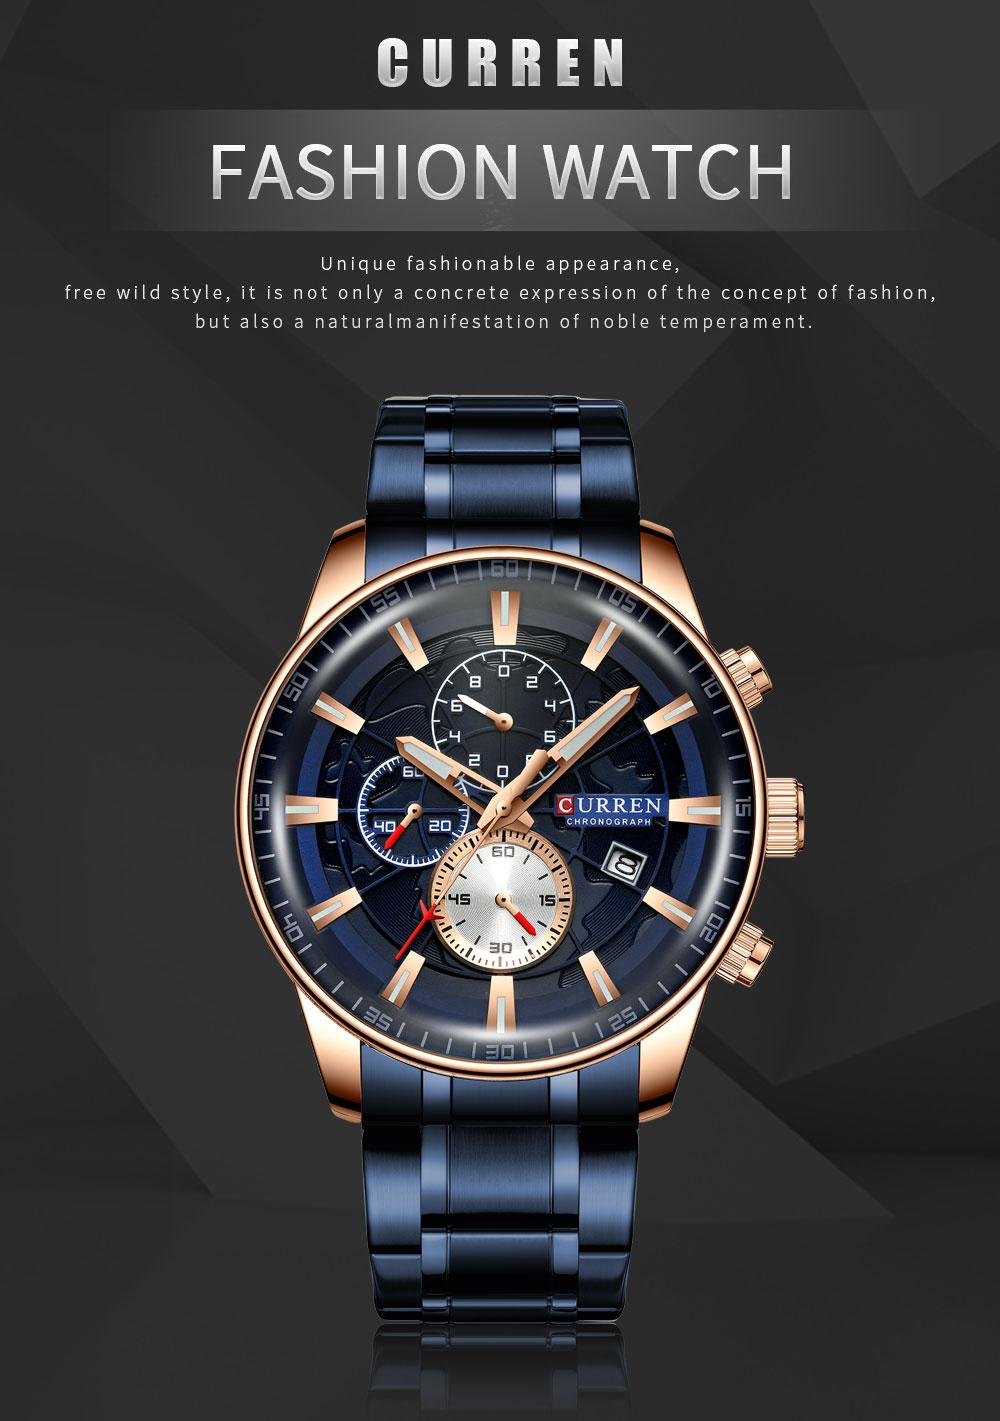 Hf82236ef59044ebe9b4dec168c9c4677n Men's Watches CURREN Top Luxury Brand Fashion Quartz Men Watch Waterproof Chronograph Business Wristwatch Relogio Masculino